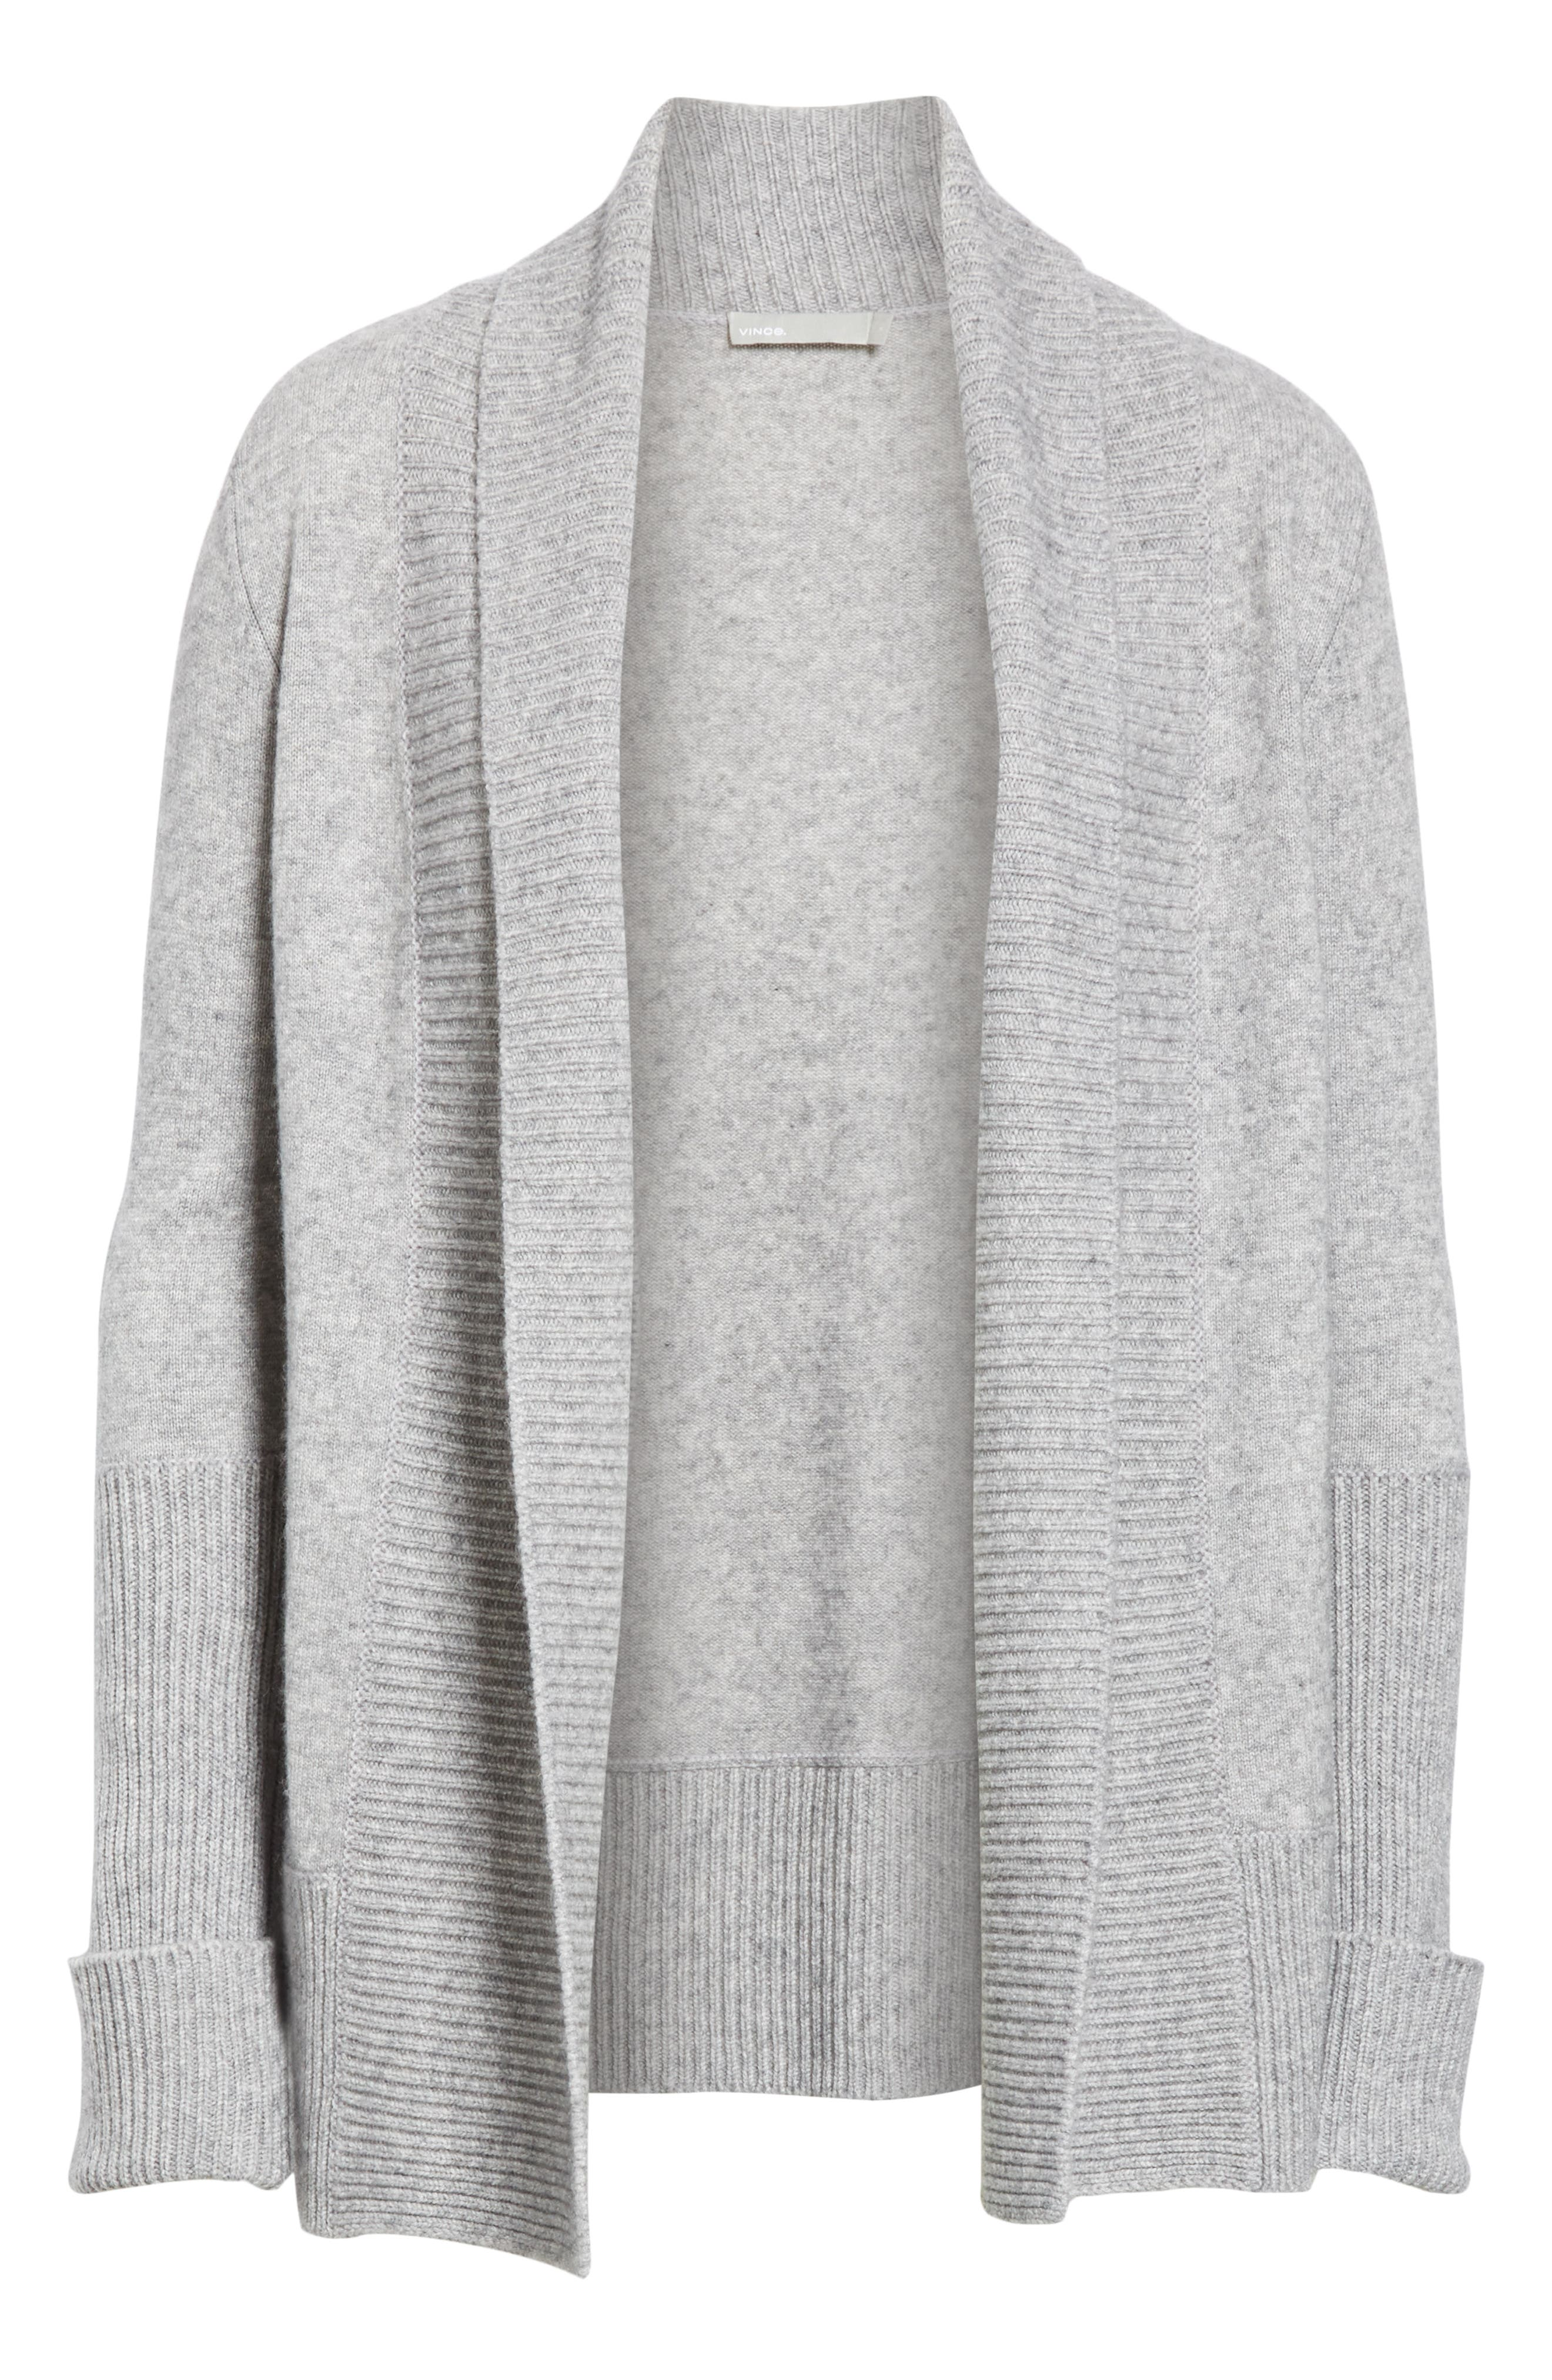 VINCE, Wool & Cashmere Cardigan, Alternate thumbnail 6, color, H STEEL